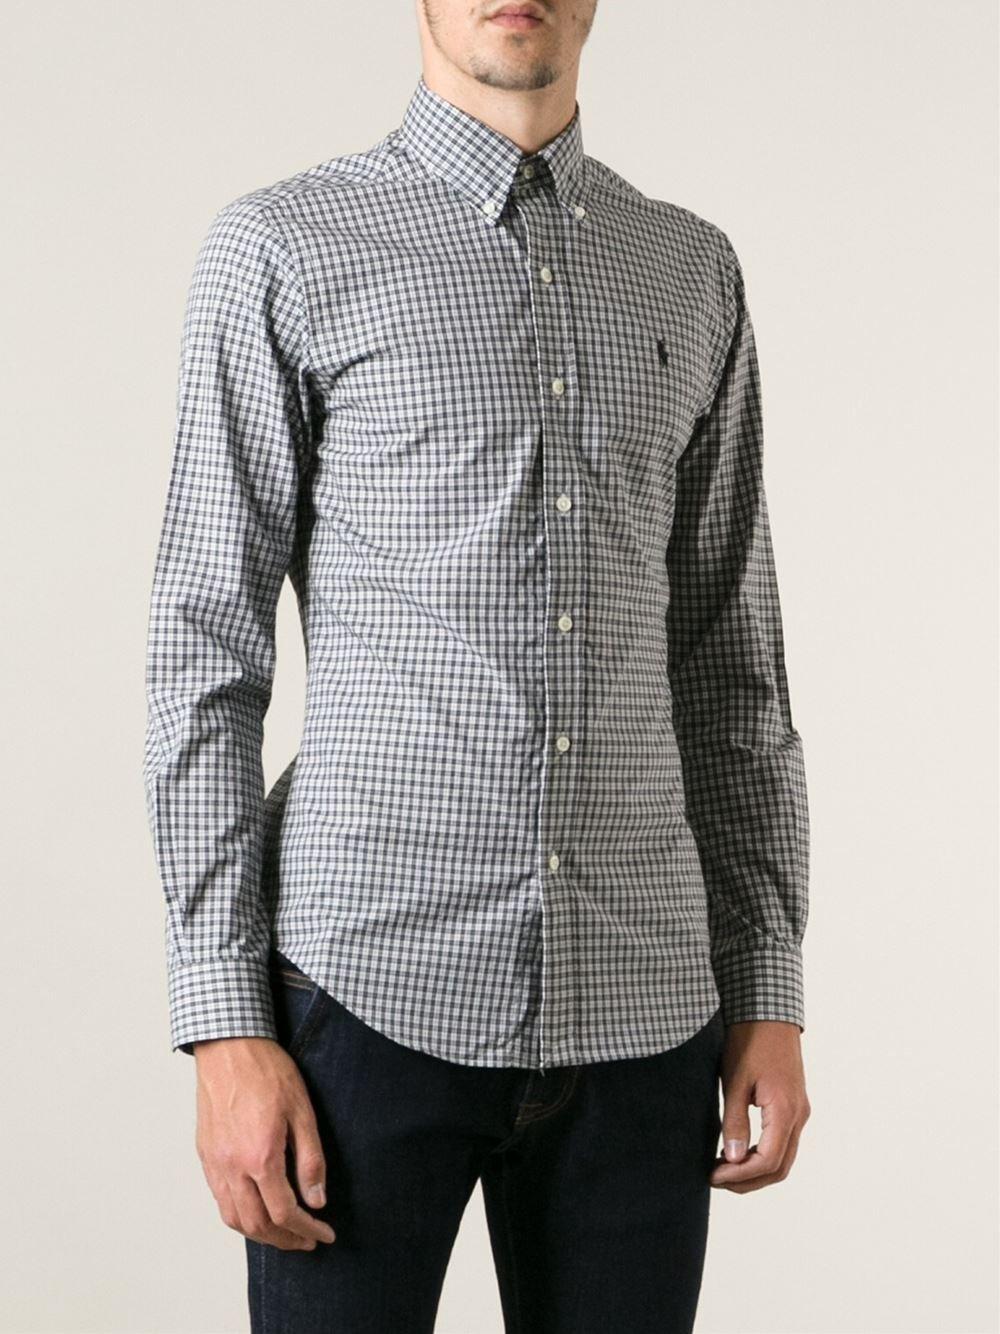 Polo ralph lauren checked button down shirt in black for for Polo ralph lauren casual button down shirts